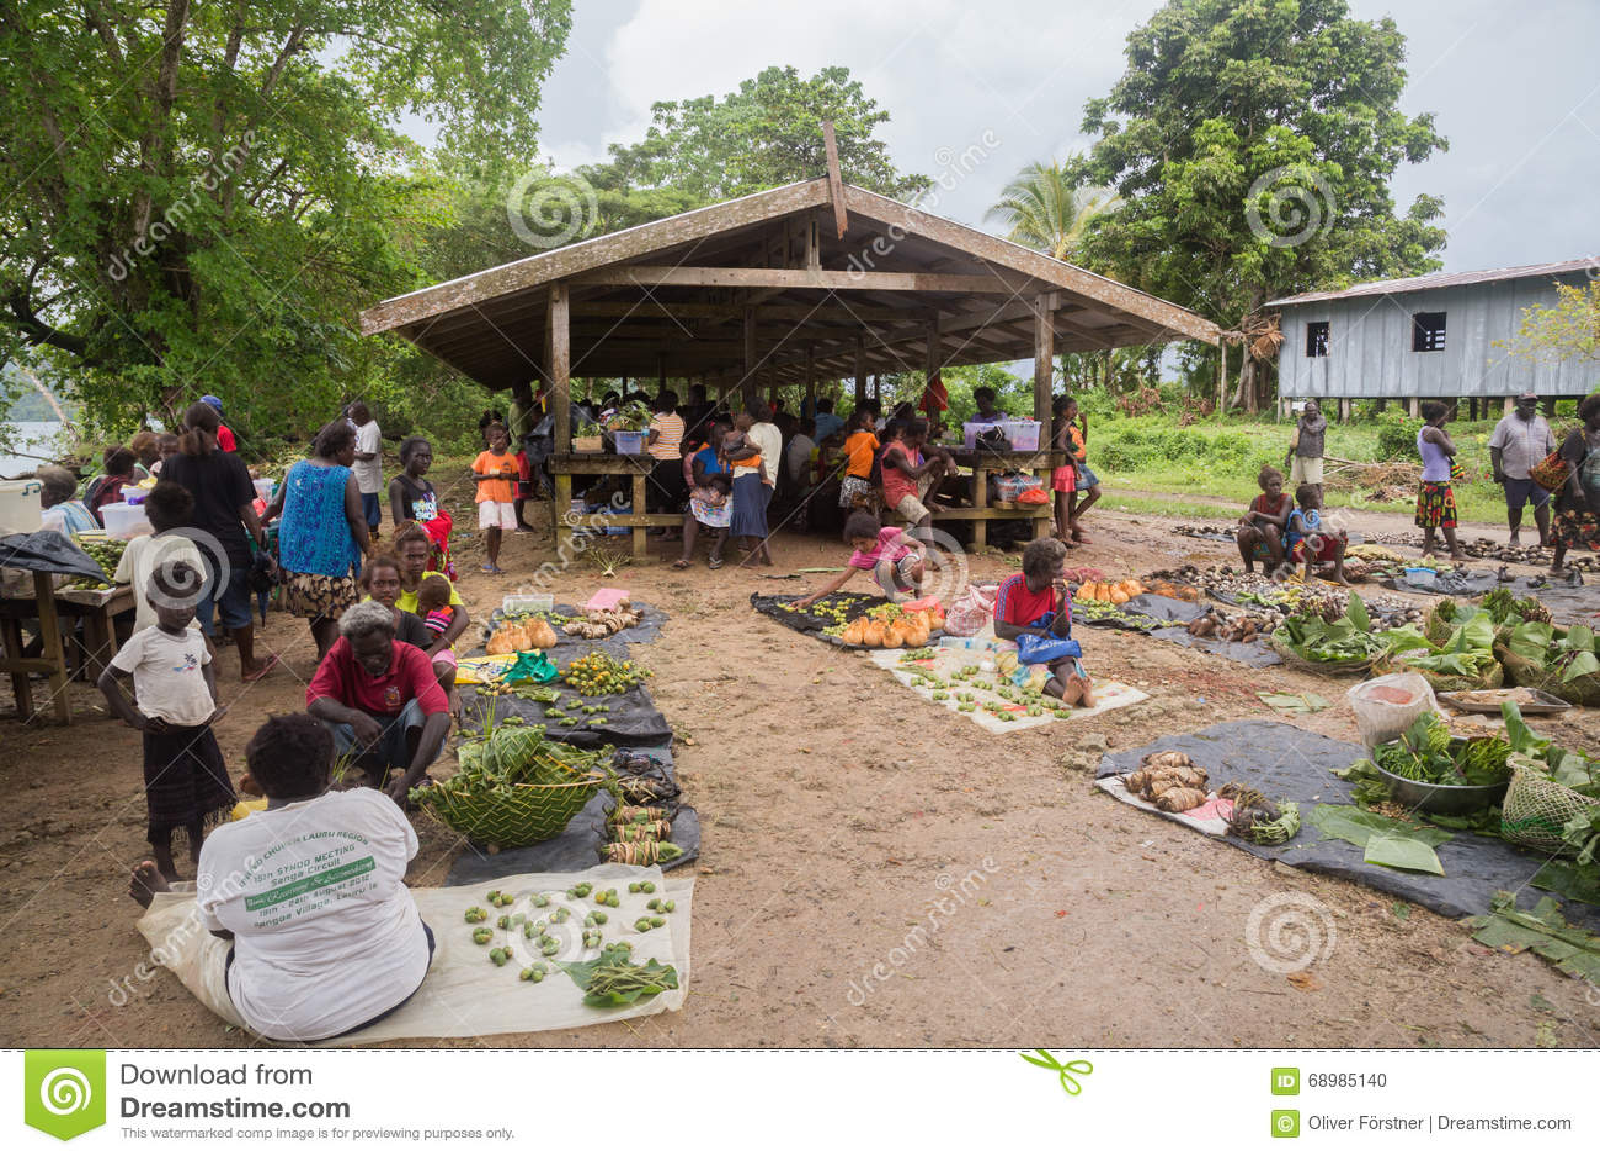 Solomon Islands Local Market